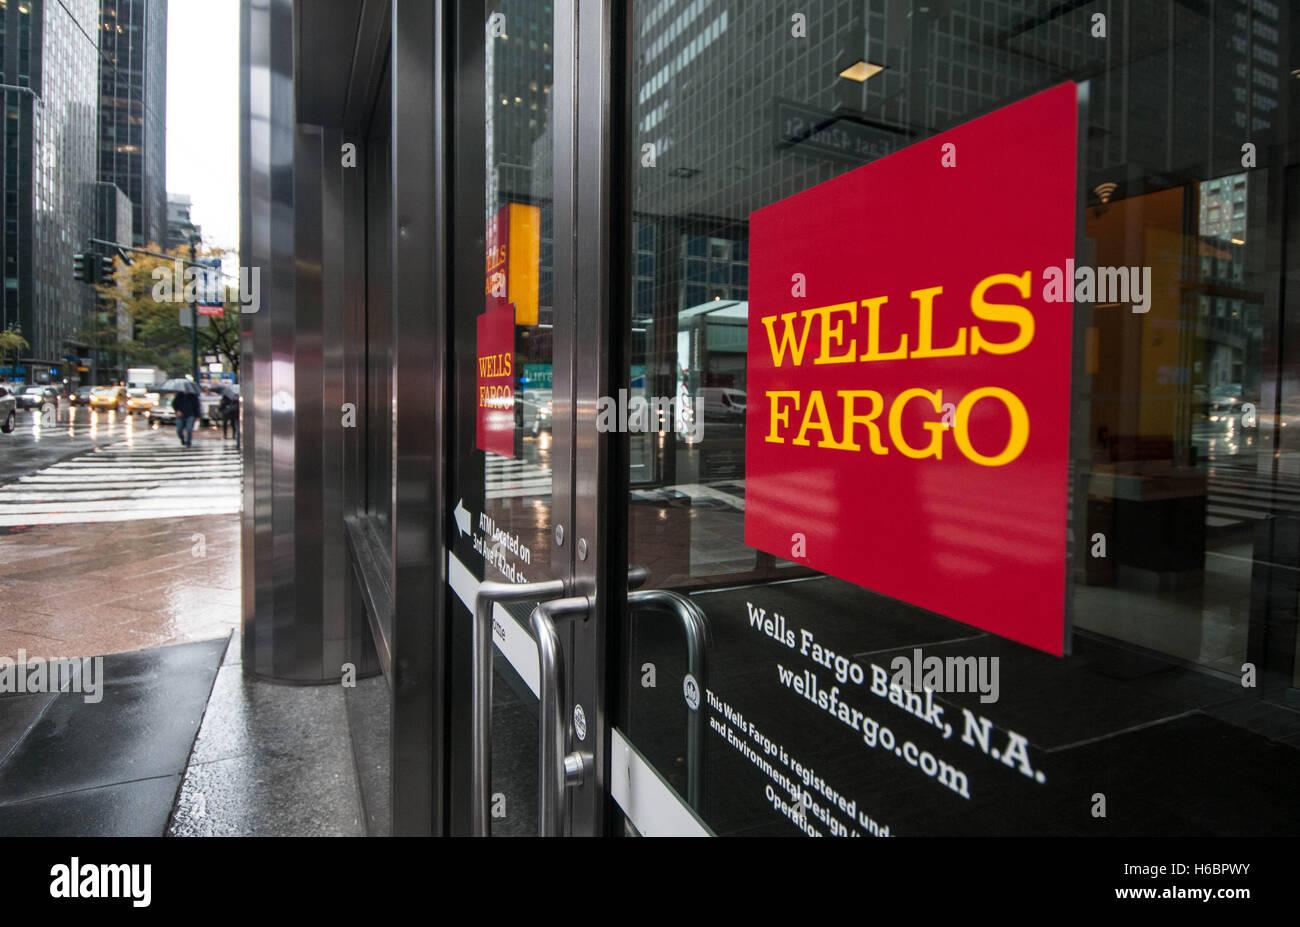 Wells Fargo Logo Stock Photos & Wells Fargo Logo Stock Images - Alamy